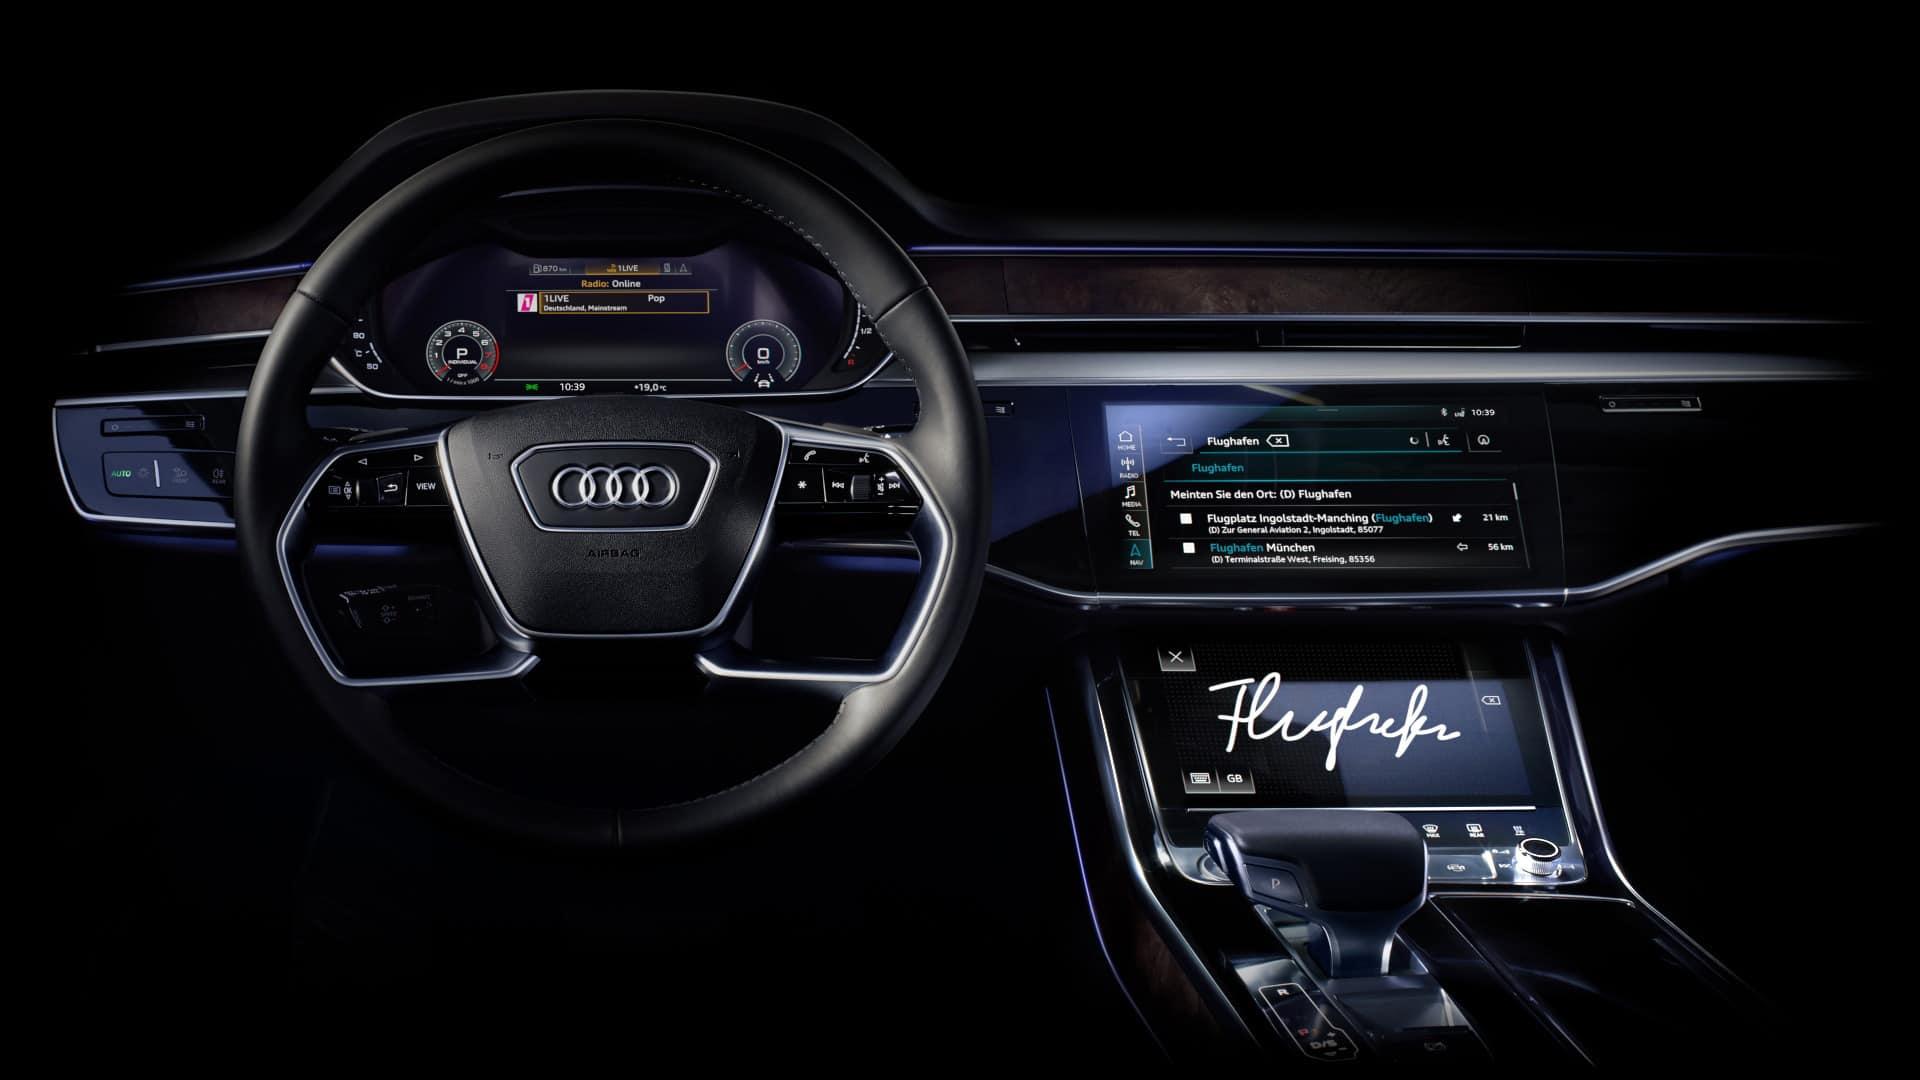 Nowe A8 L Gt A8 Gt Audi Polska Przewaga Dzięki Technice